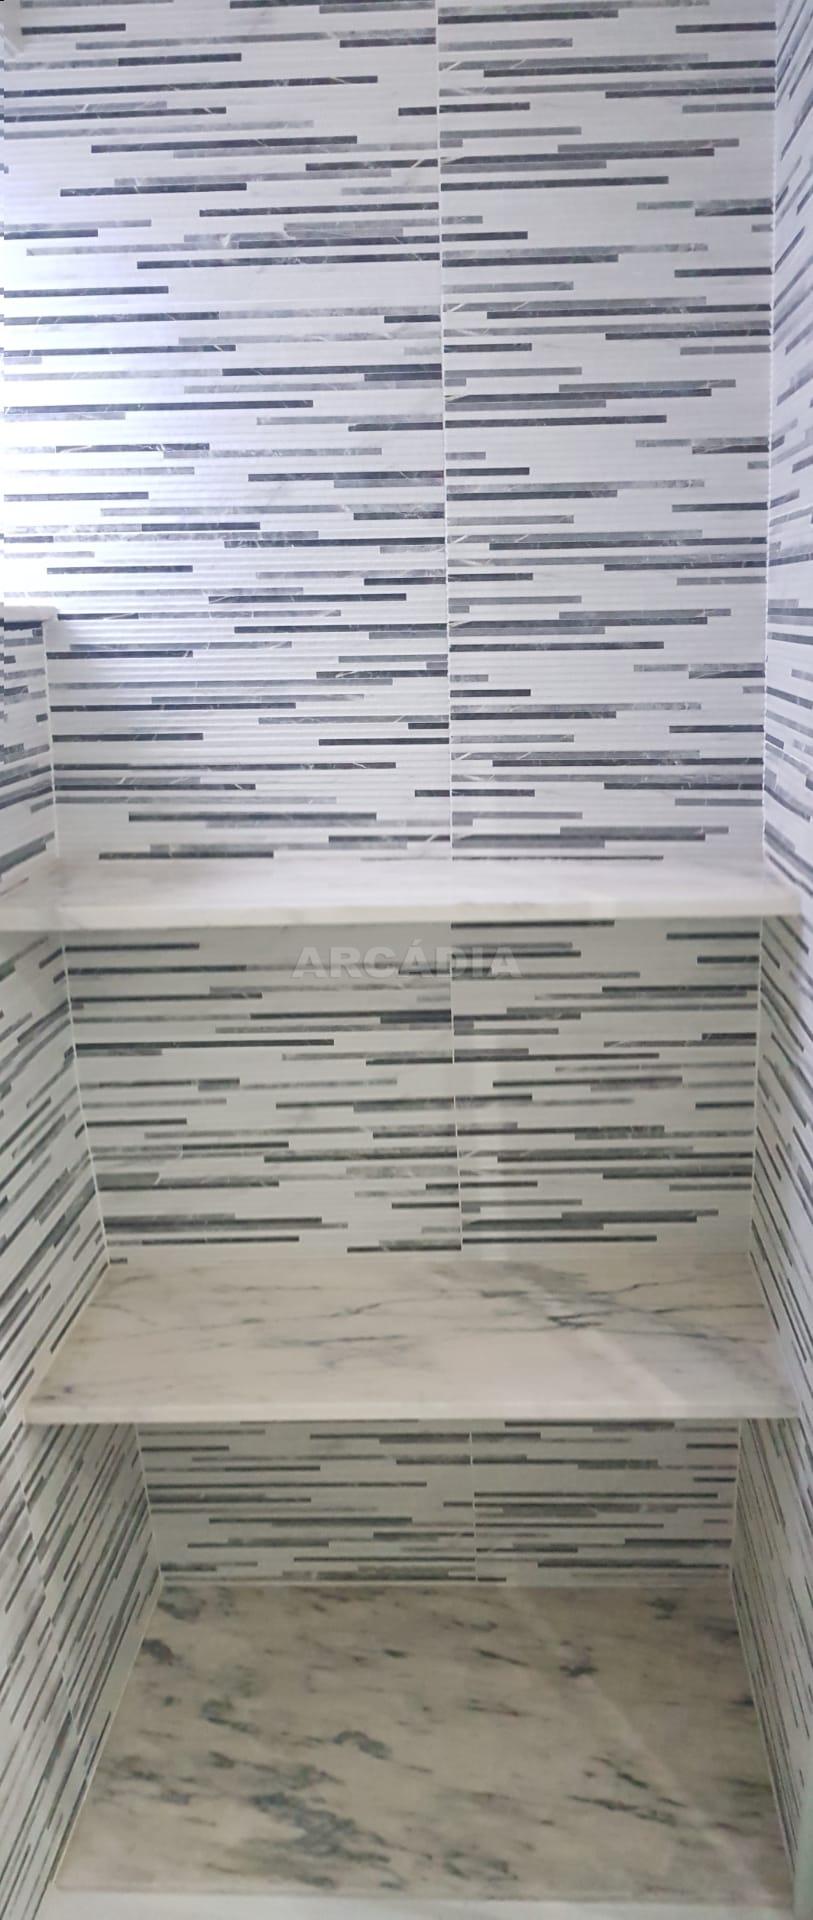 arcadia-imobiliaria-braga-apartamento-tipo-3-arrendamento-sao-lazaro-remodelado-excelente-preco-unica-oportunidade27